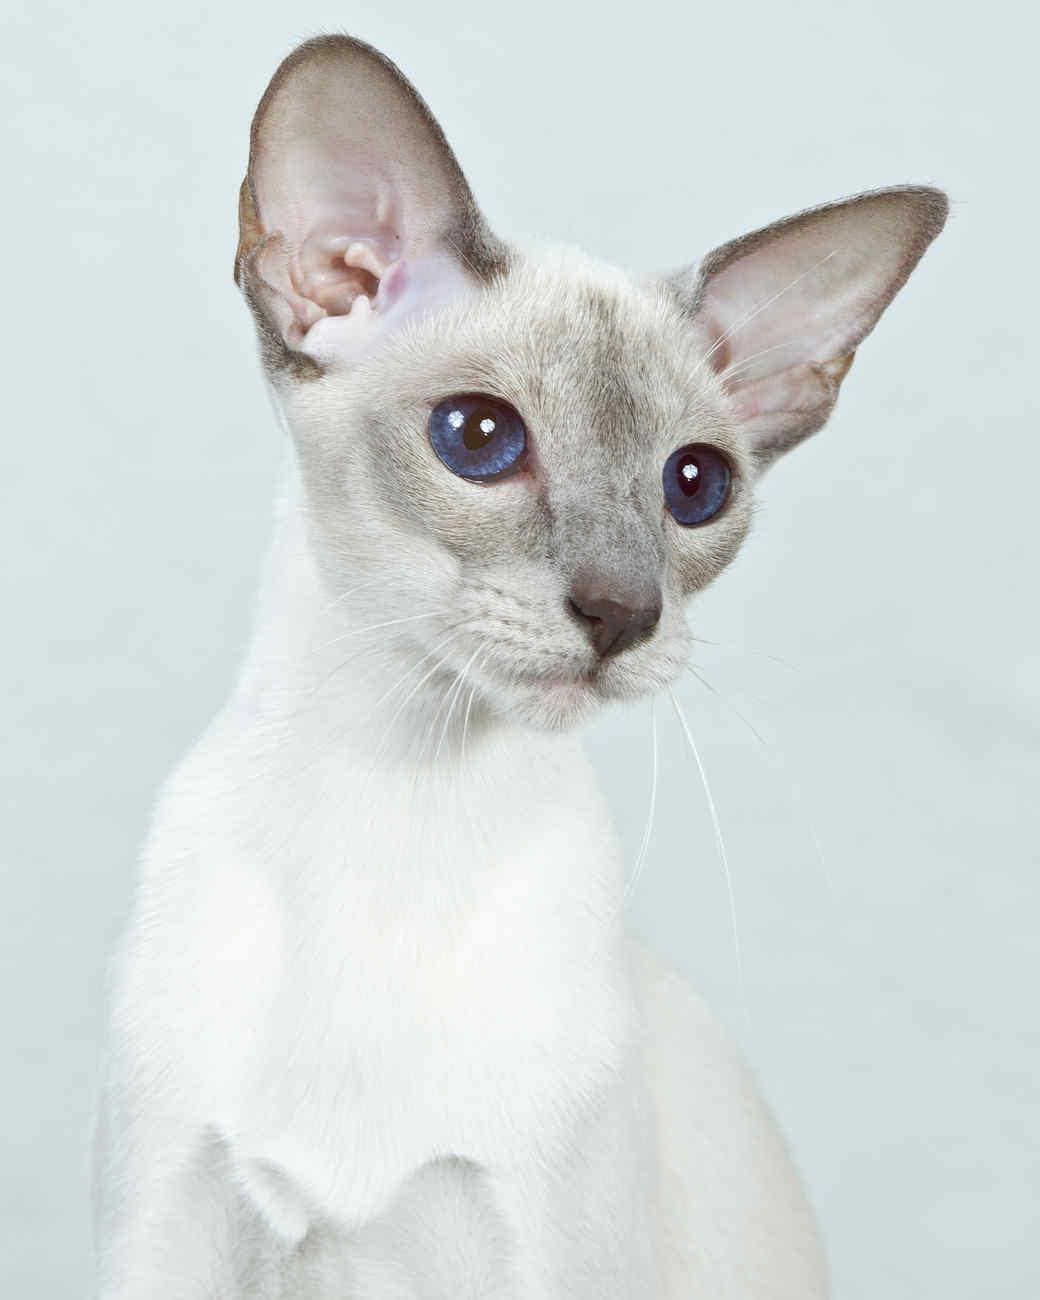 cat-breeds-siamese-mi04-139.jpg